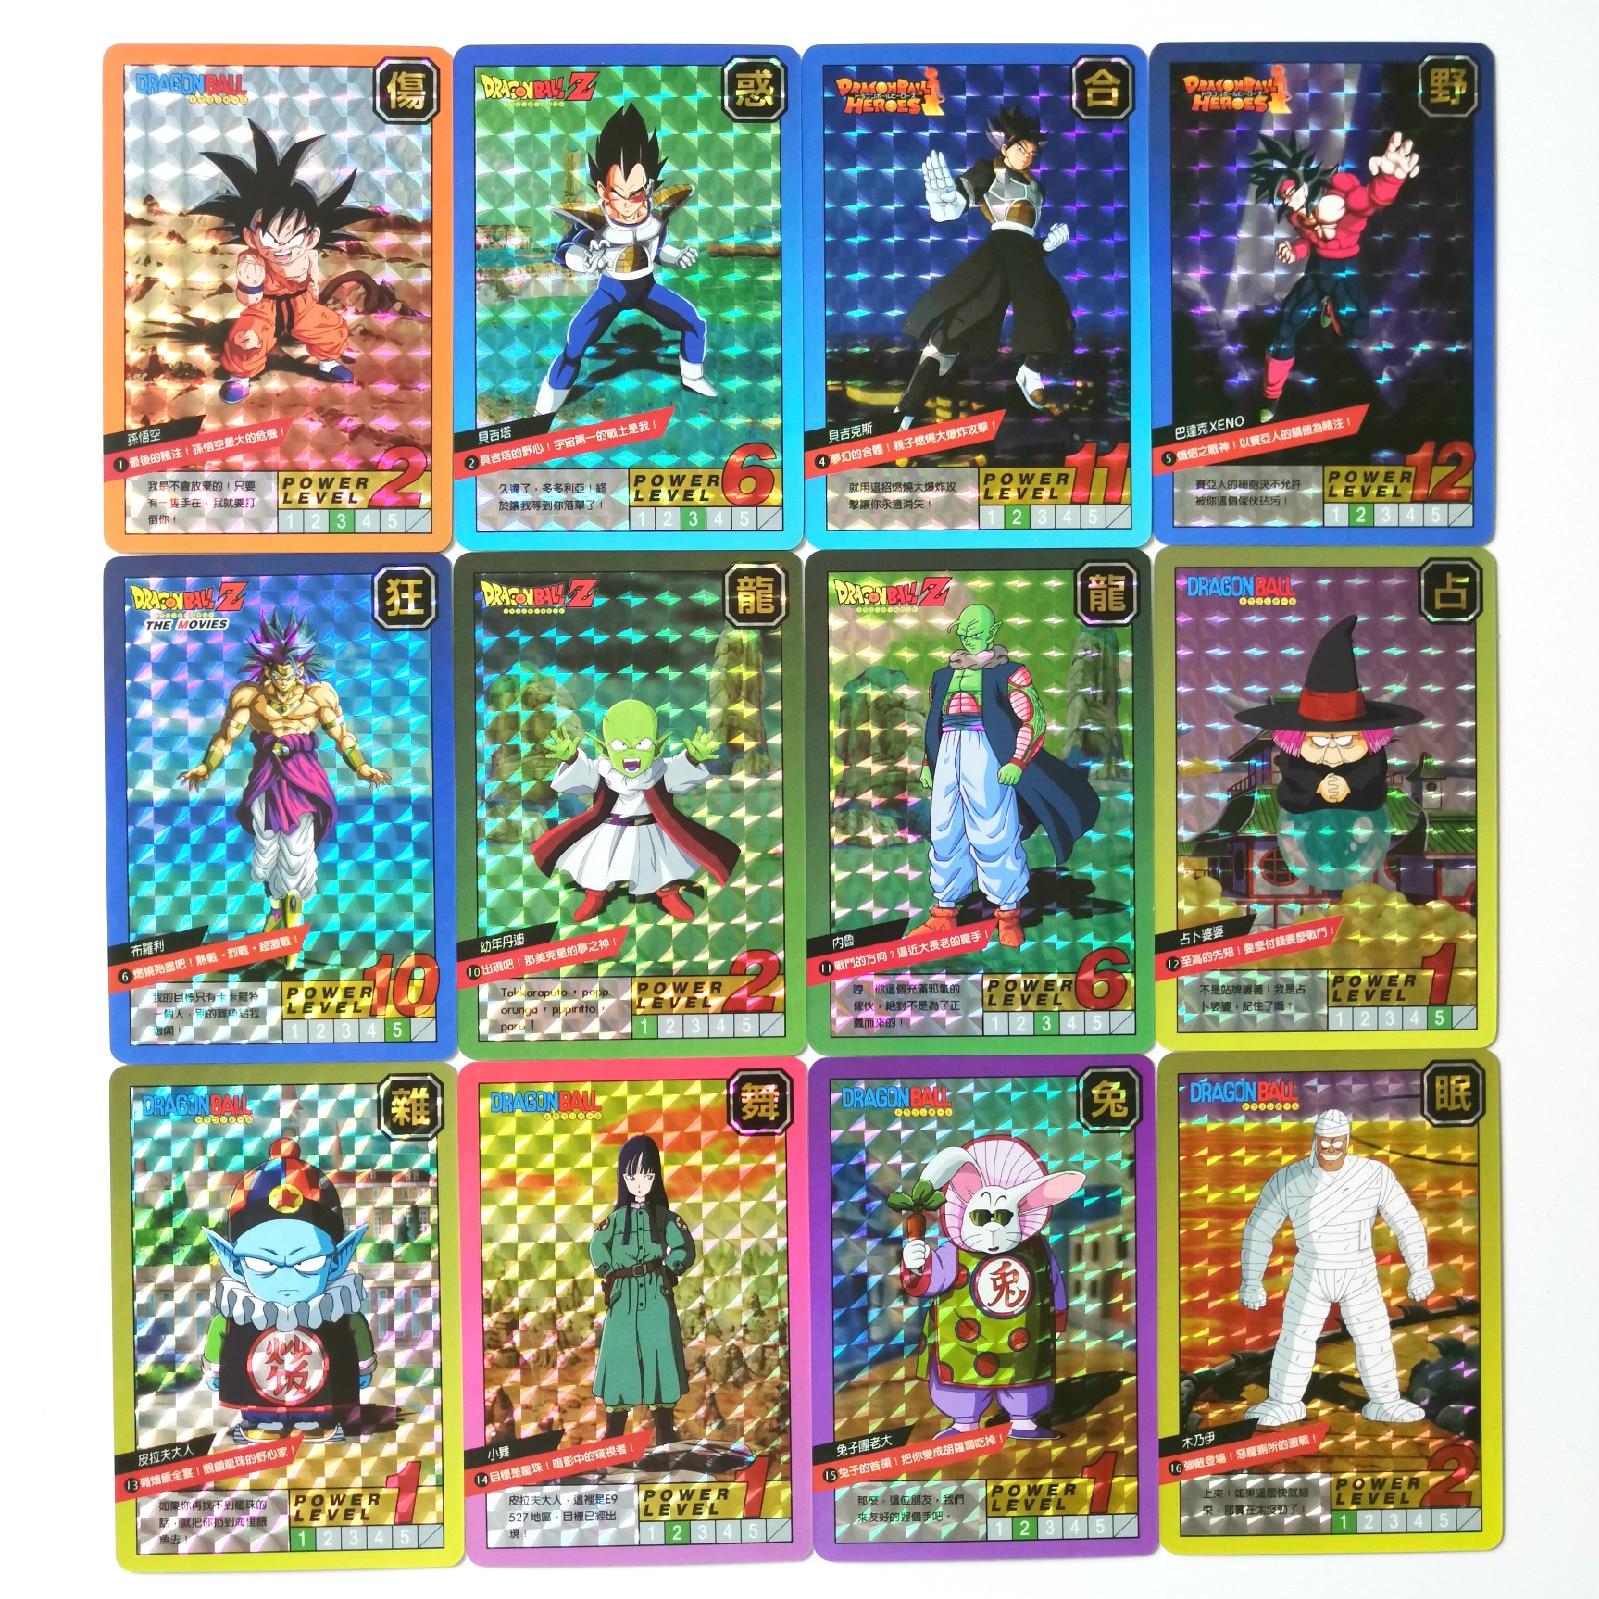 55pcs Super Dragon Ball Z Fight Heroes Battle Card Ultra Instinct Goku Vegeta Game Collection Cards